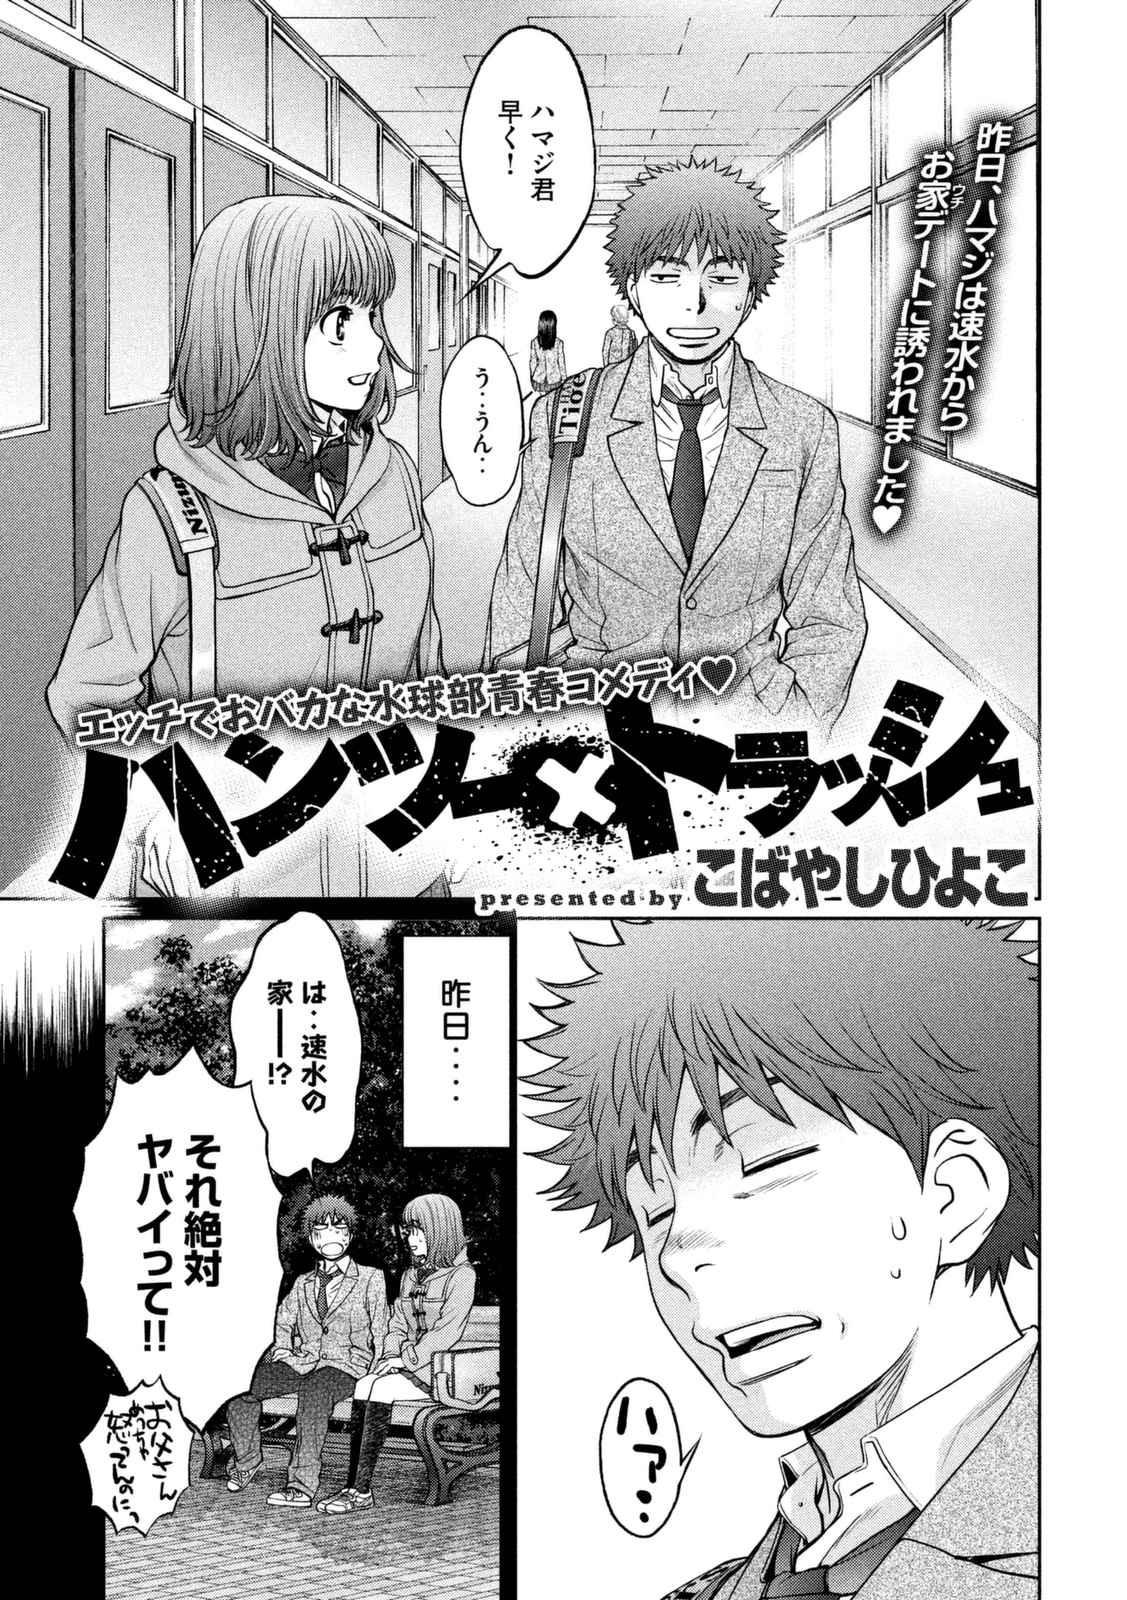 Hantsu_x_Trash Chapter 145 Page 1